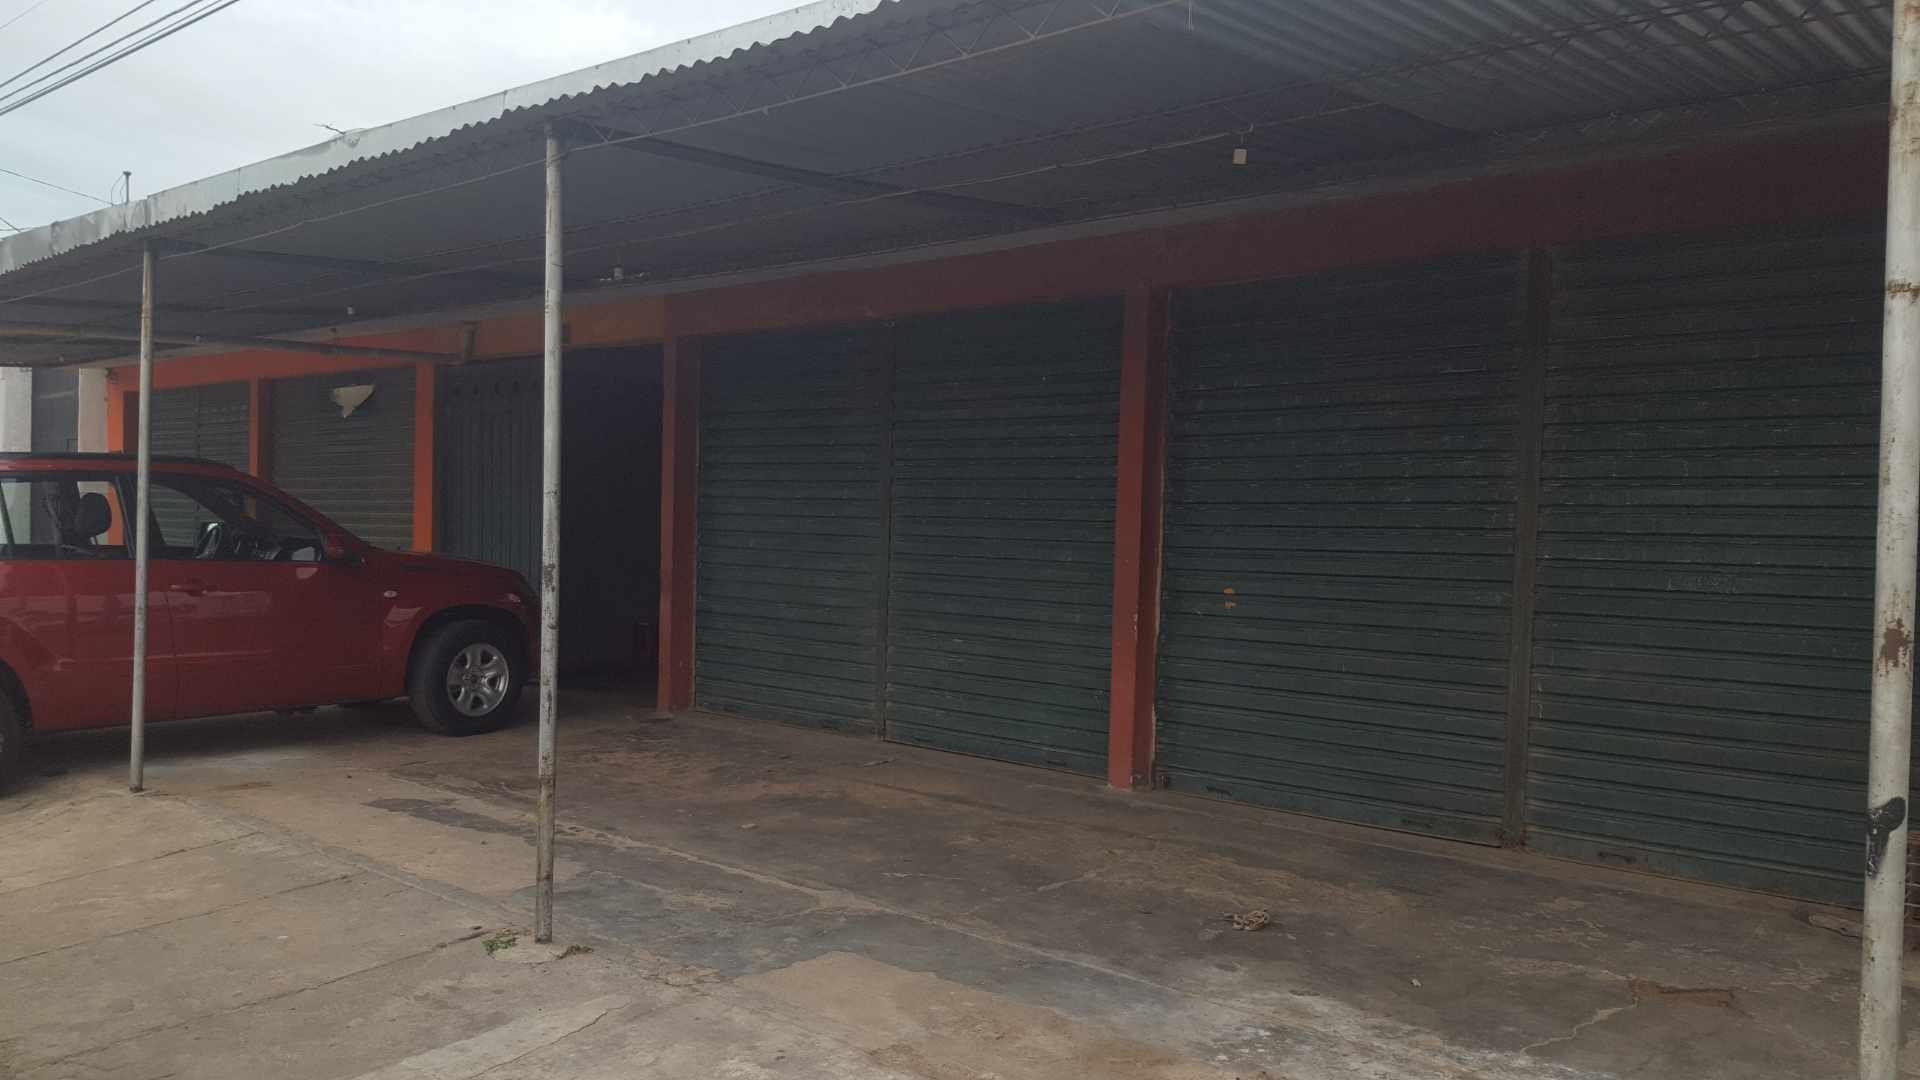 Local comercial en Venta Av. Rolando de Chazal a 10 mts del 4to anillo, amplia avenida pavimentada entre Brasil y Virgen de Cotoca Foto 3